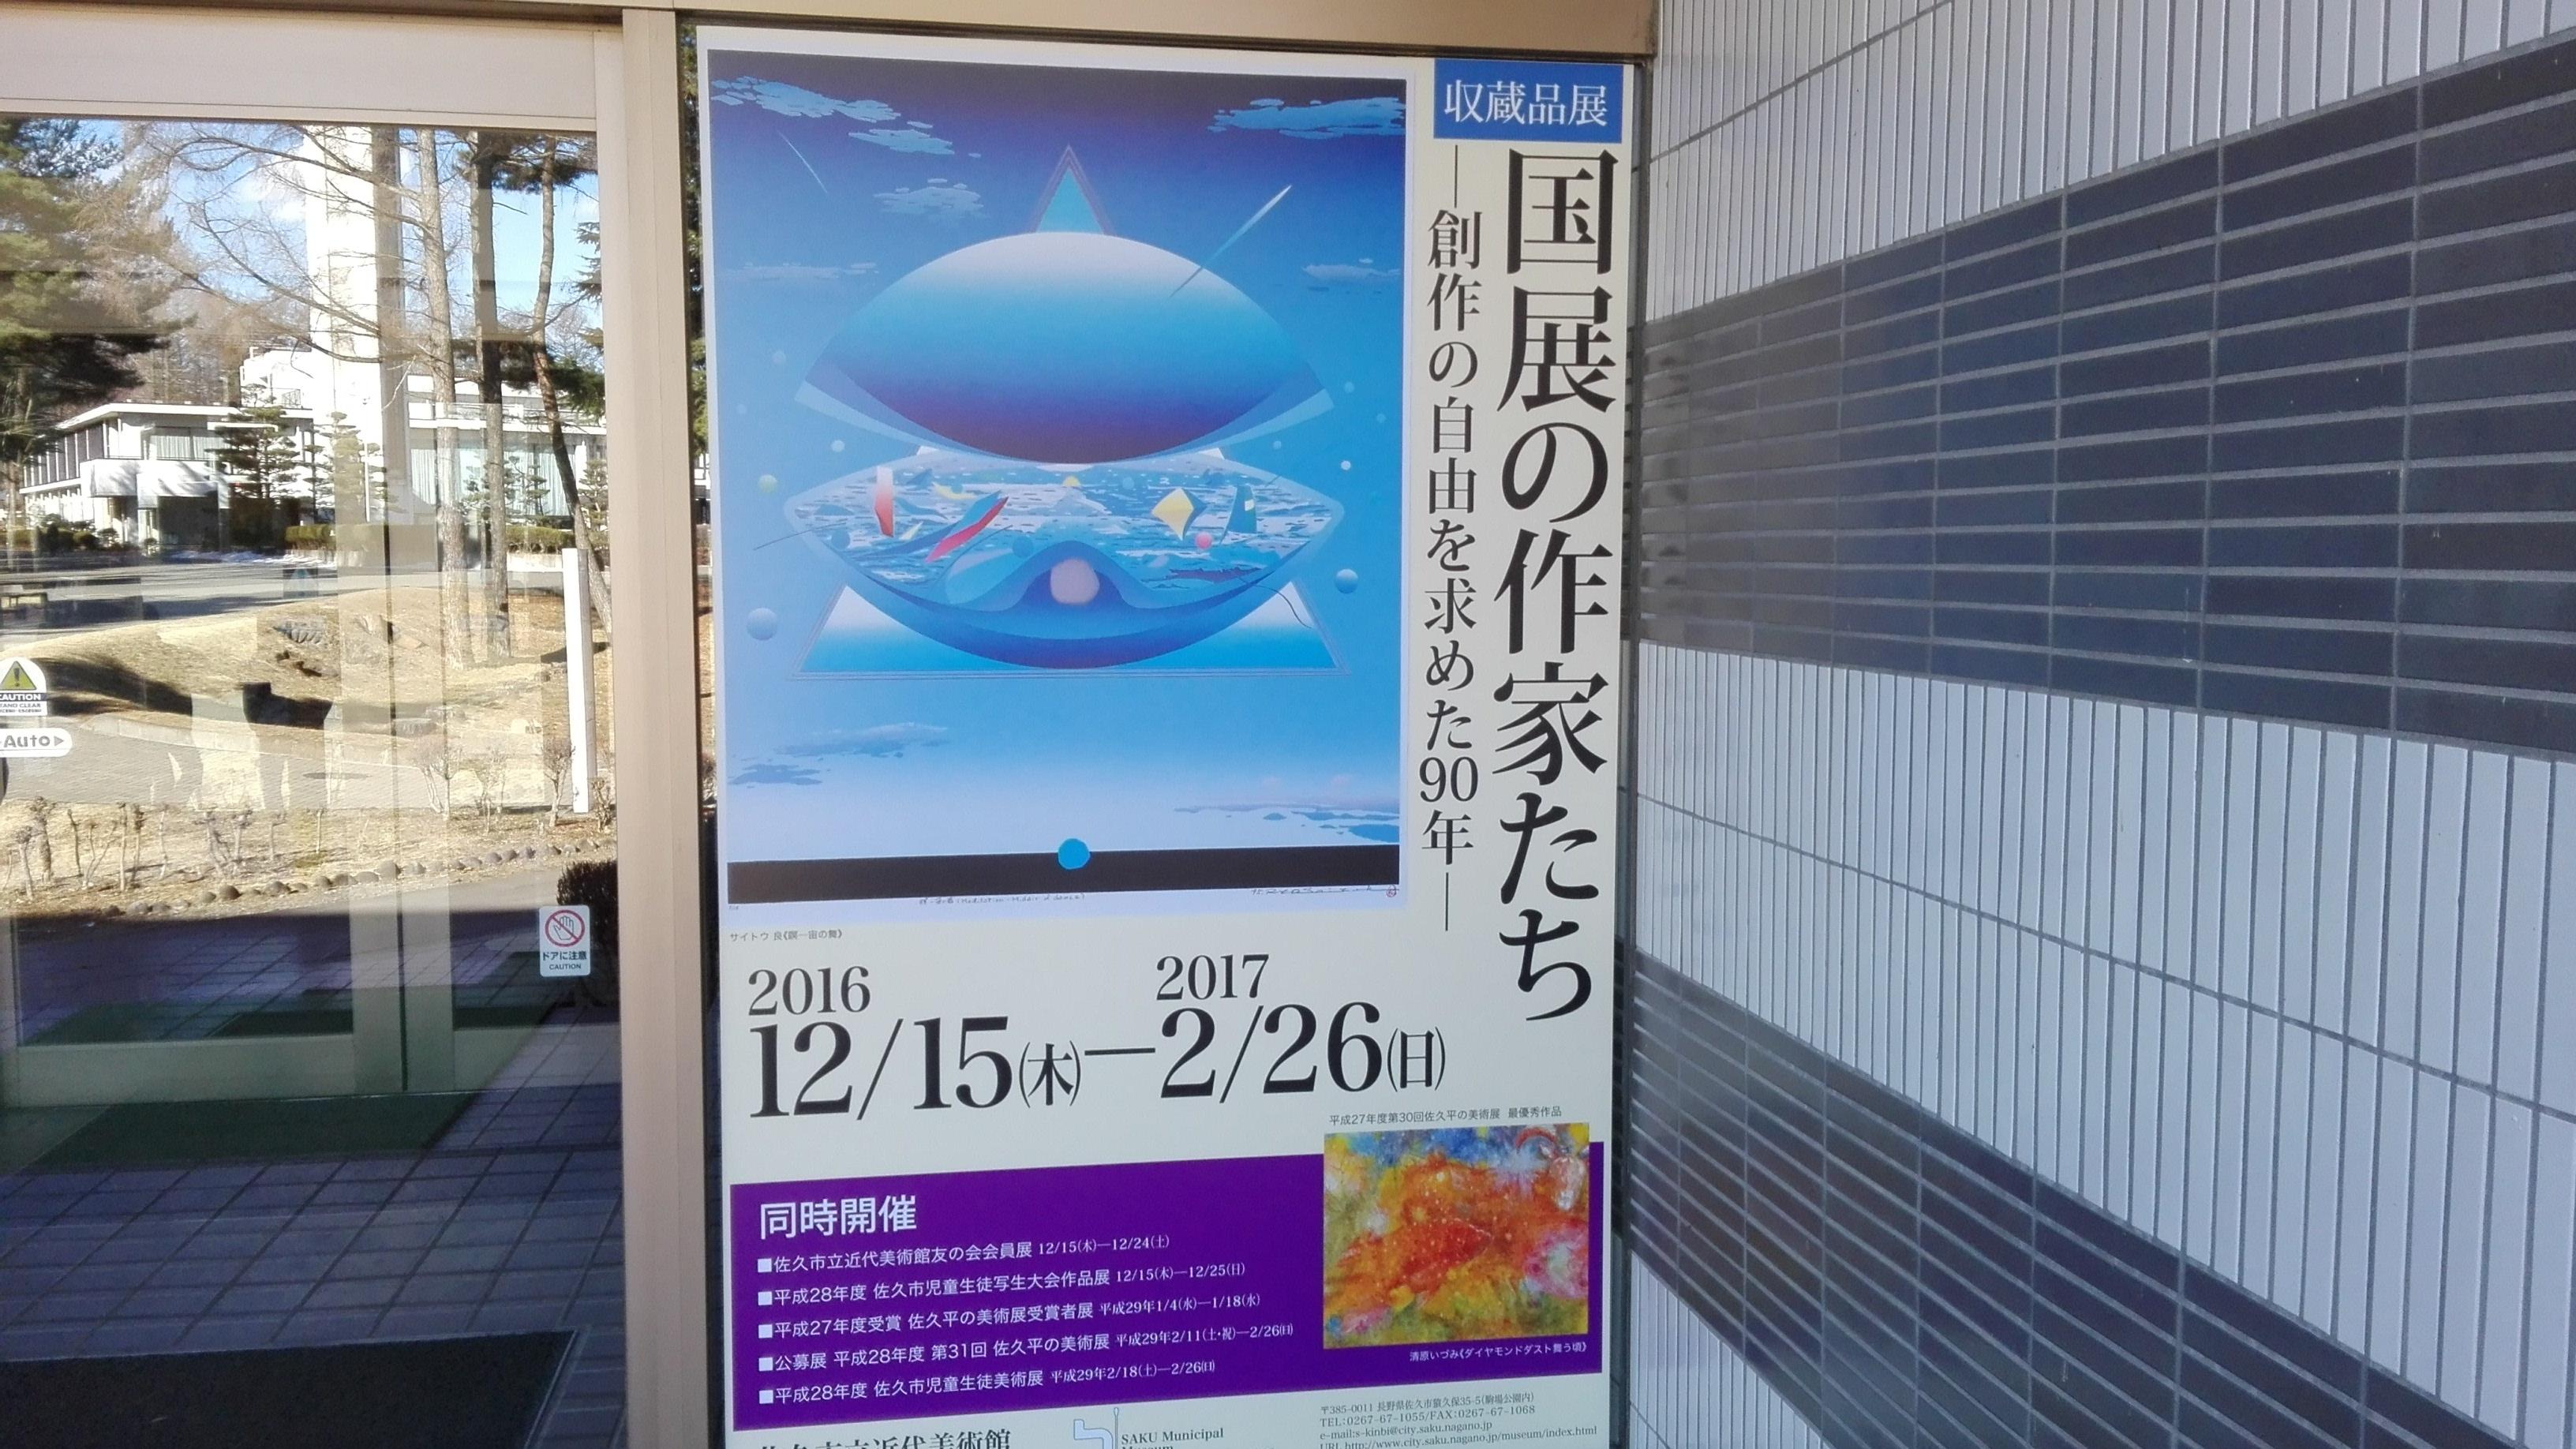 IMG_20170225_144254.jpg